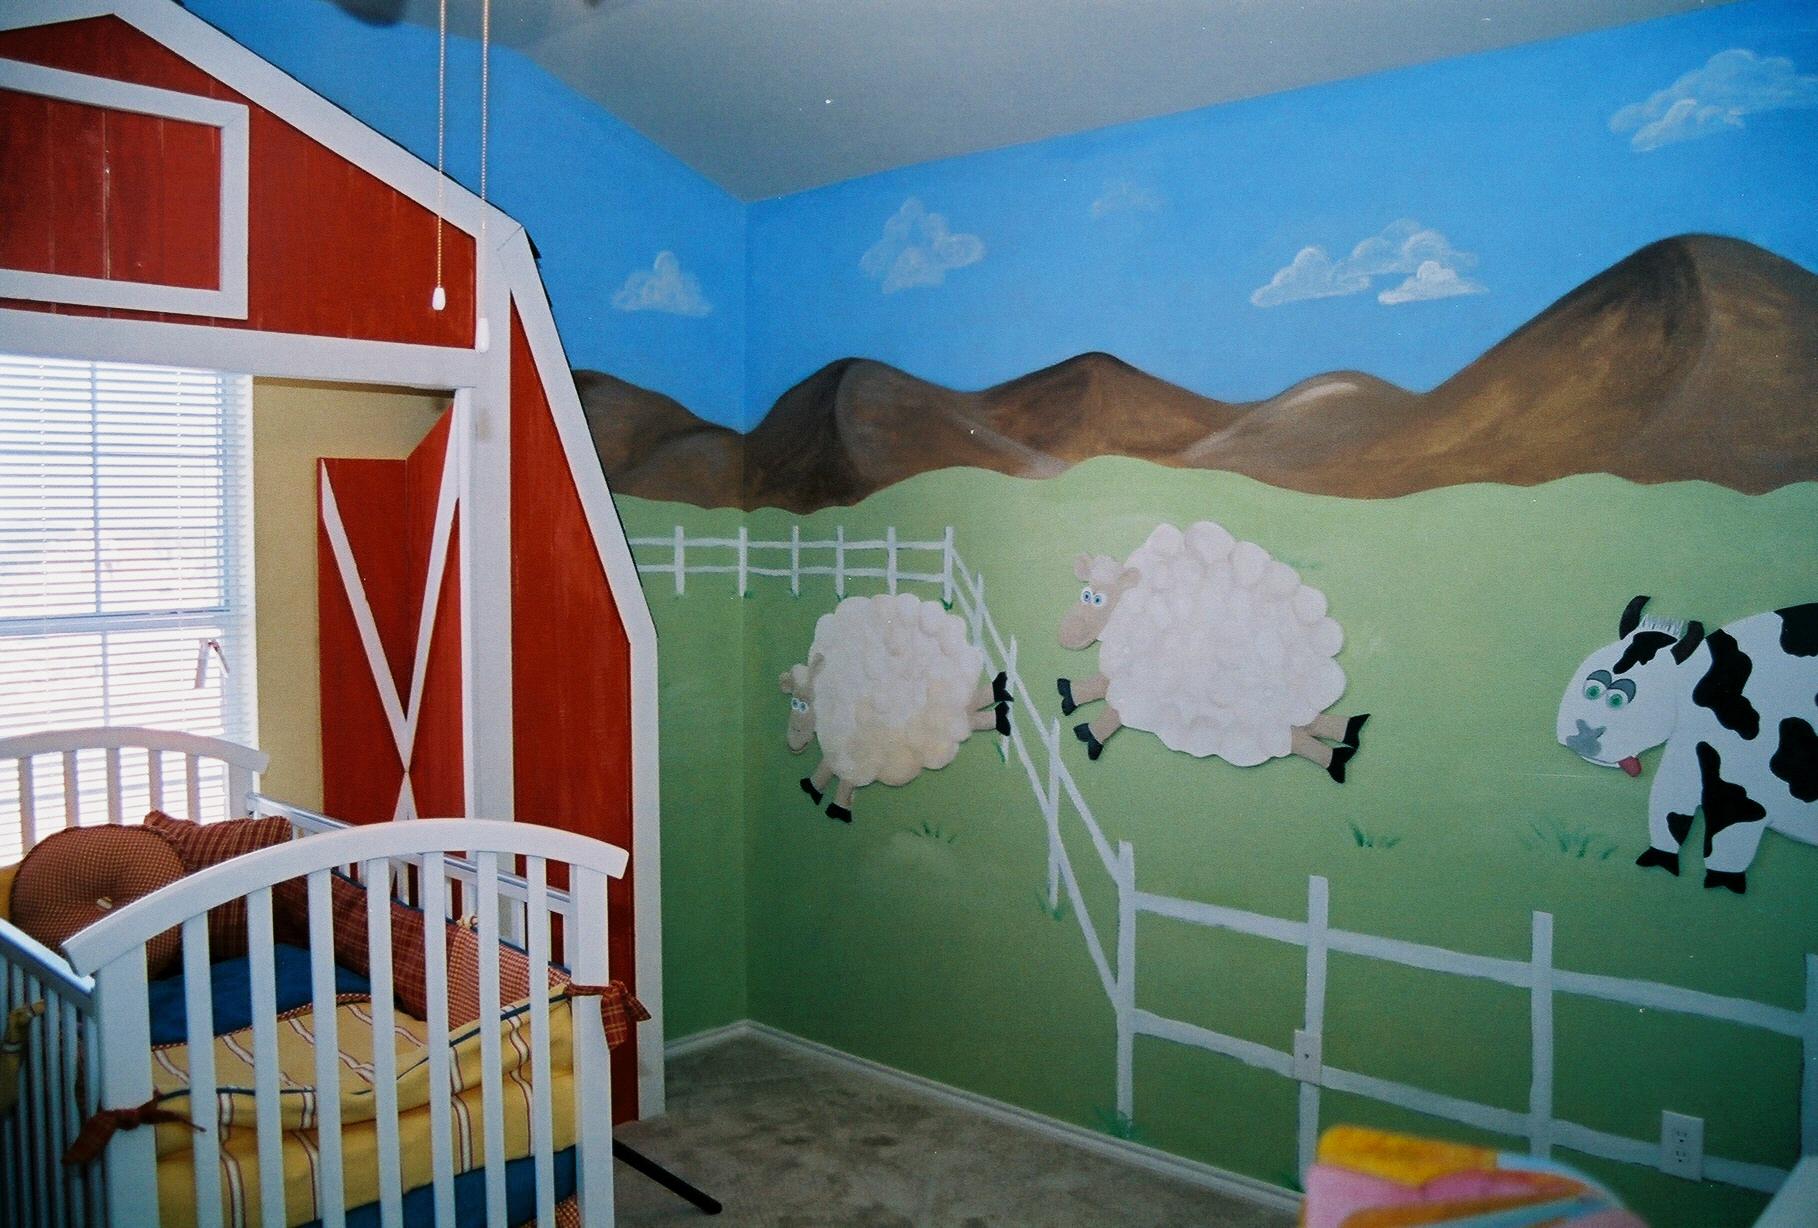 Decorative Interior Painting   Faux Painting , Faux Finish Painting,  Murals, Wall Murals, Mural, Mural Painting, Cabinet Painting   San Antonio  U0026 Austin, ...